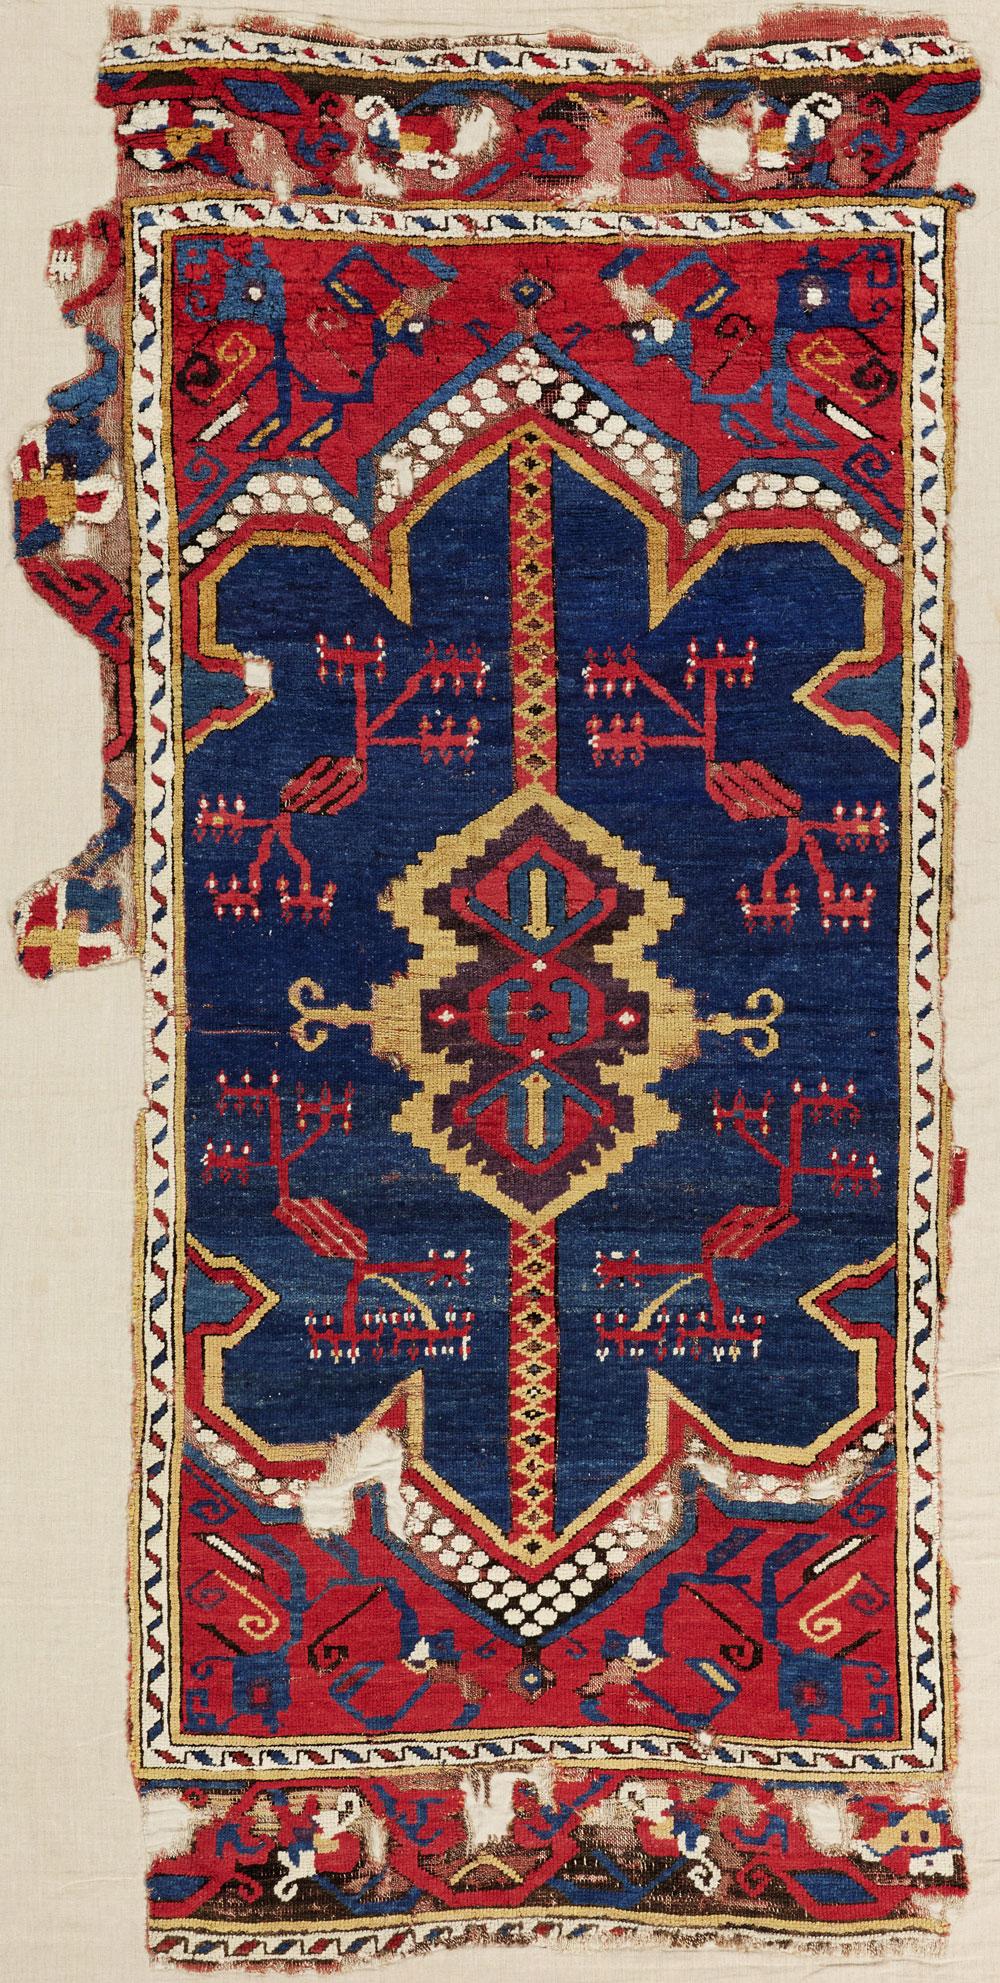 16th-17th century Central Anatolian carpet